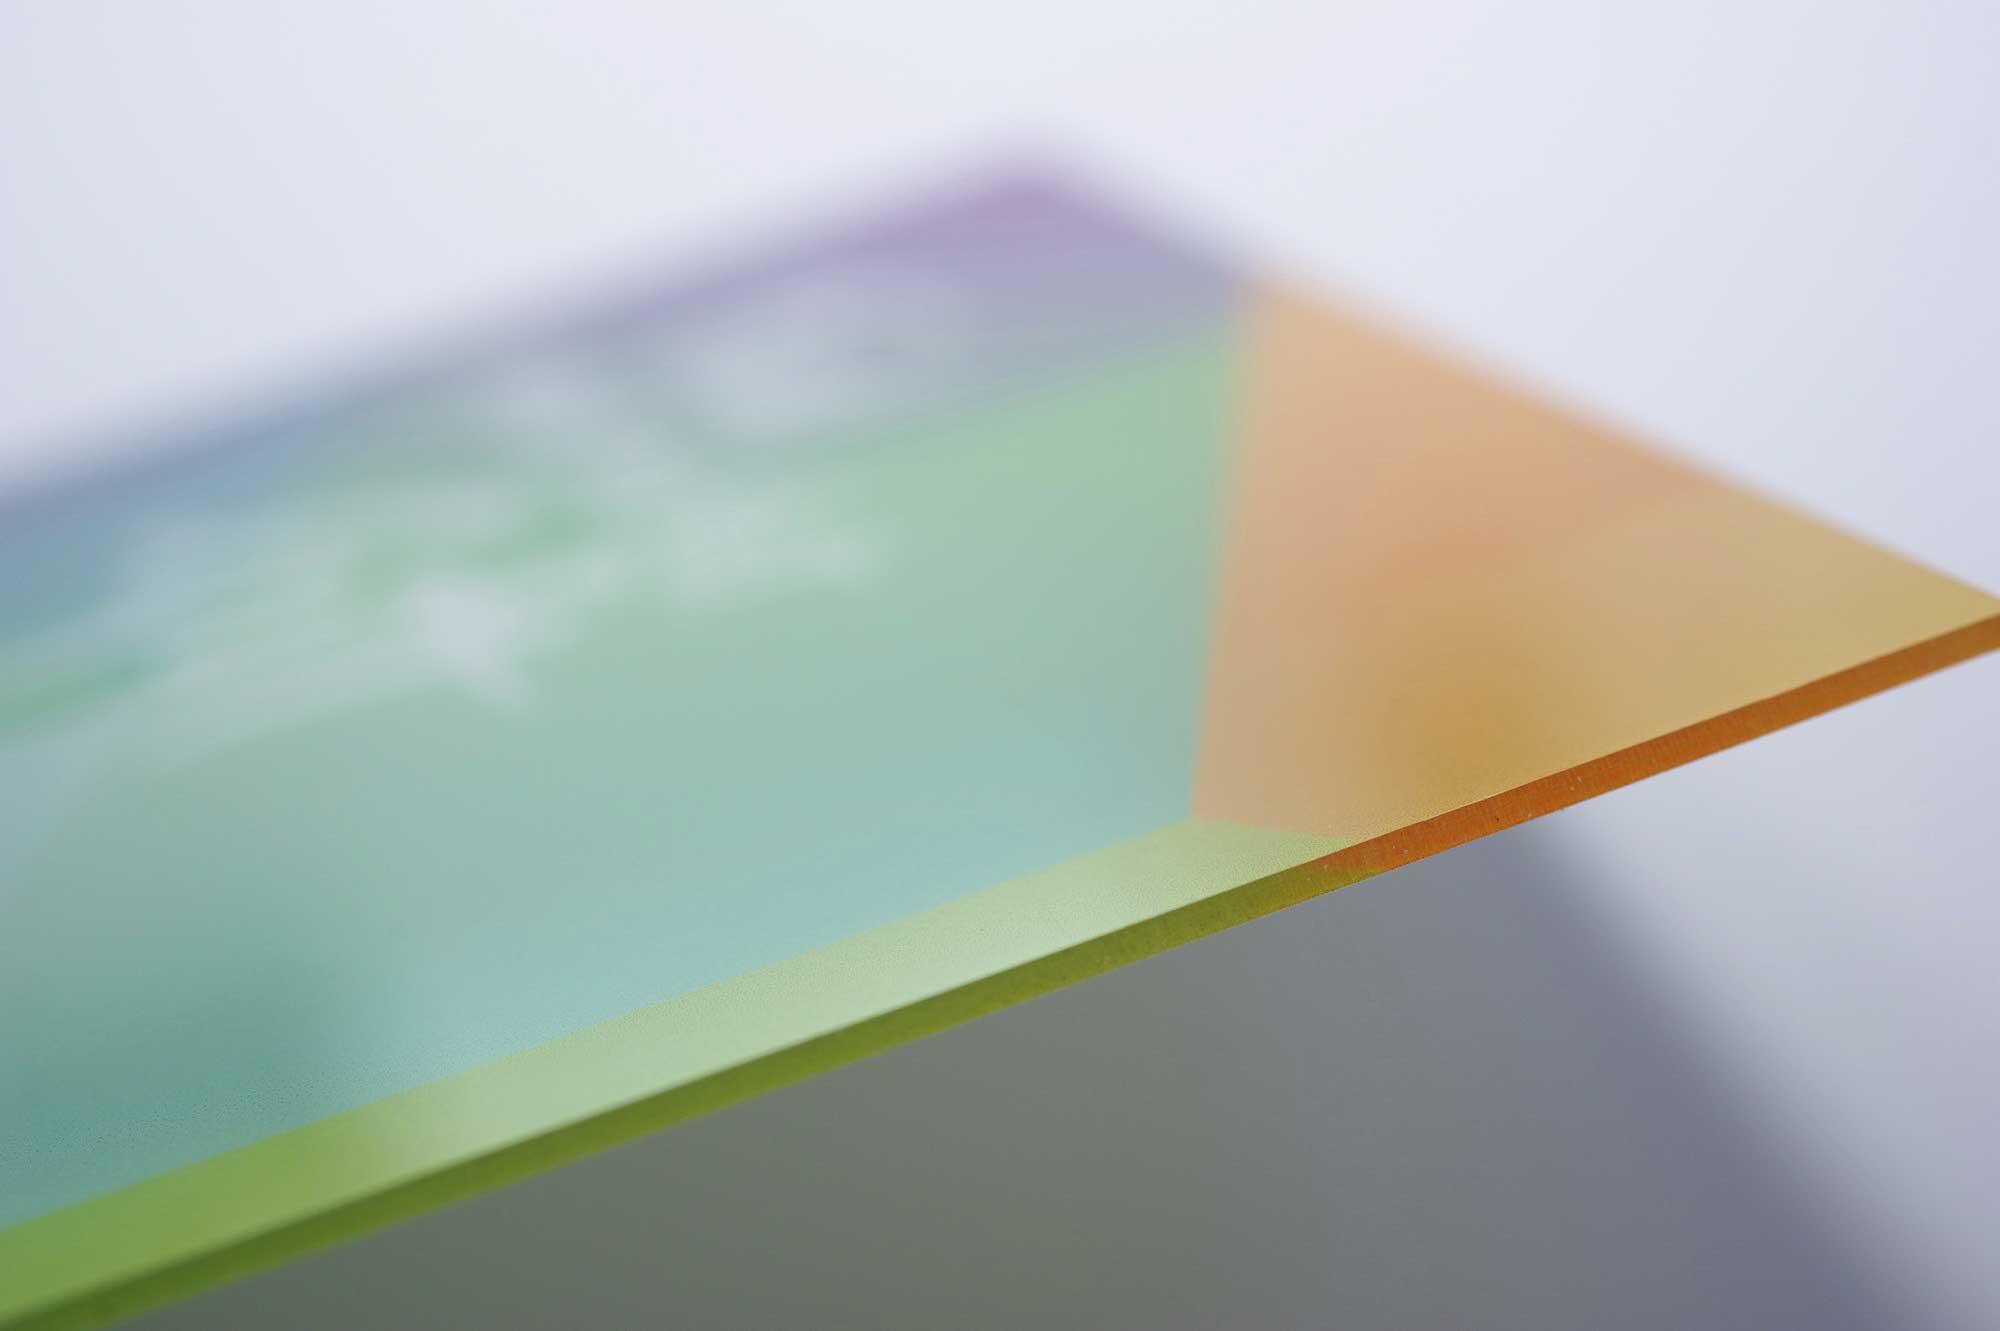 geschnittene Acrylplatte © Atelier Haase - Foto: Katharina Hannsen-Gluschitz